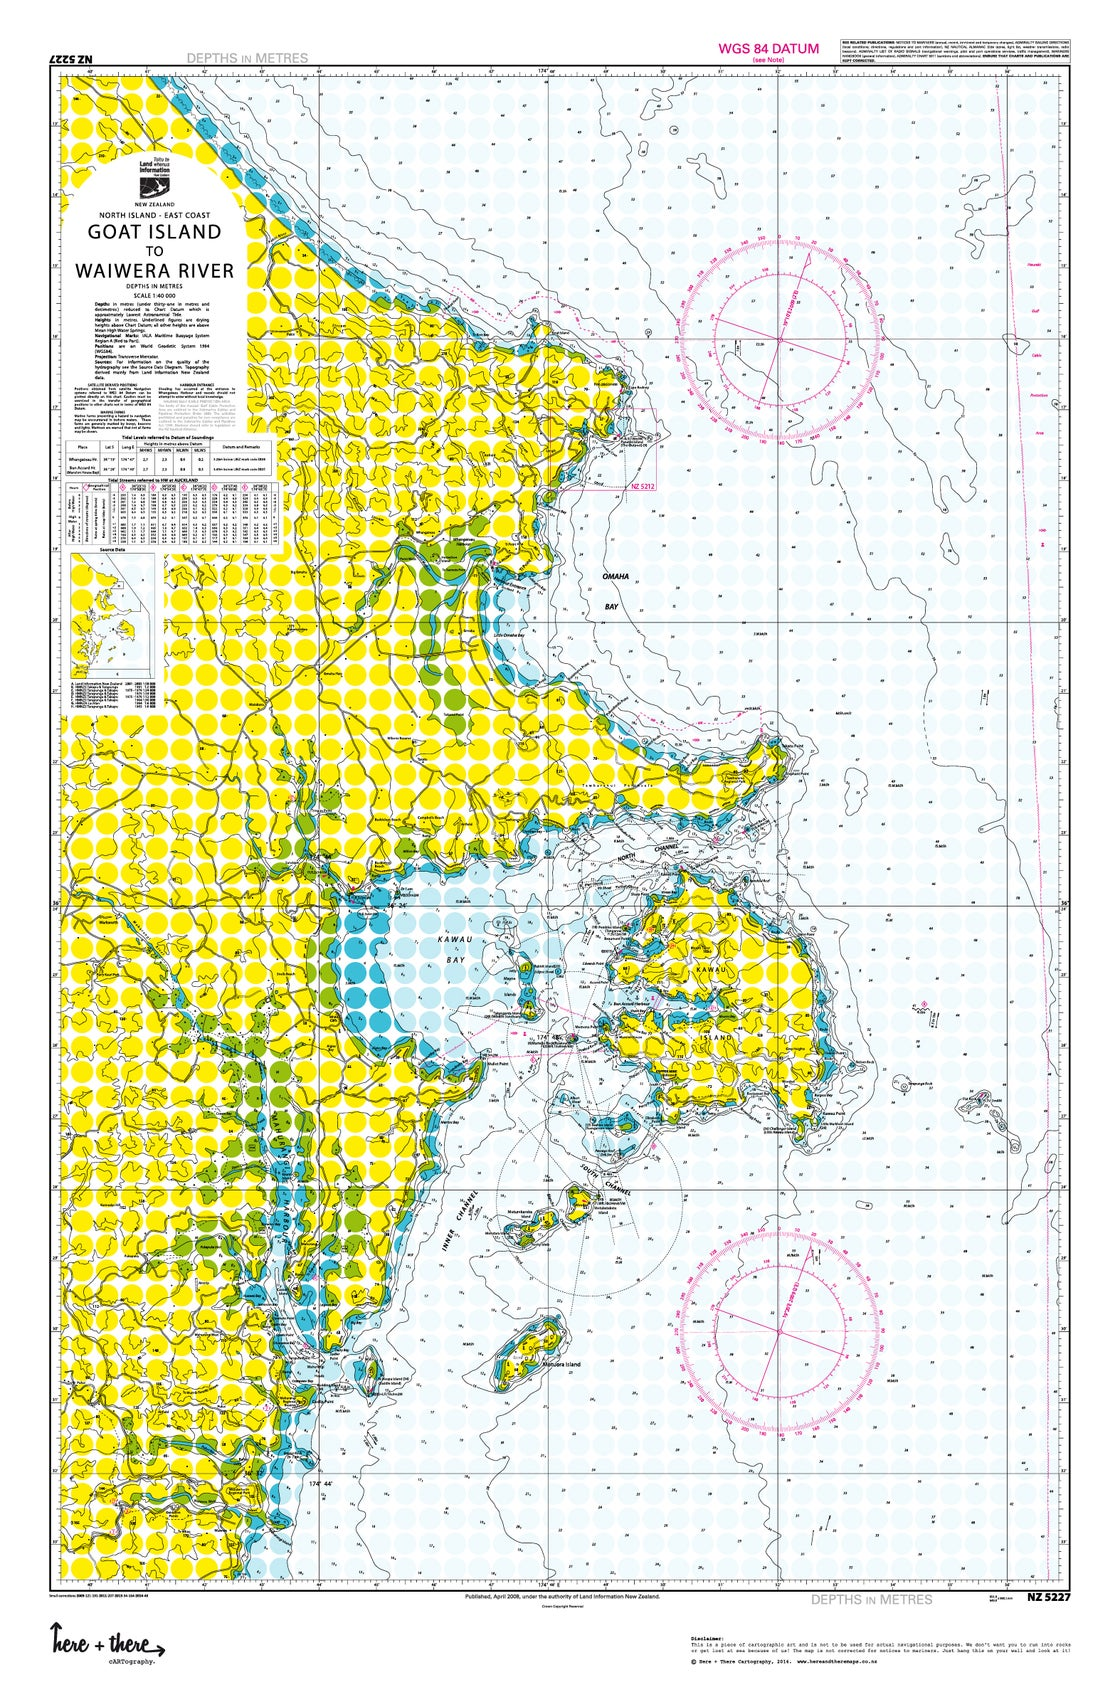 Image of Goat Island to Waiwera - Yellow Polka